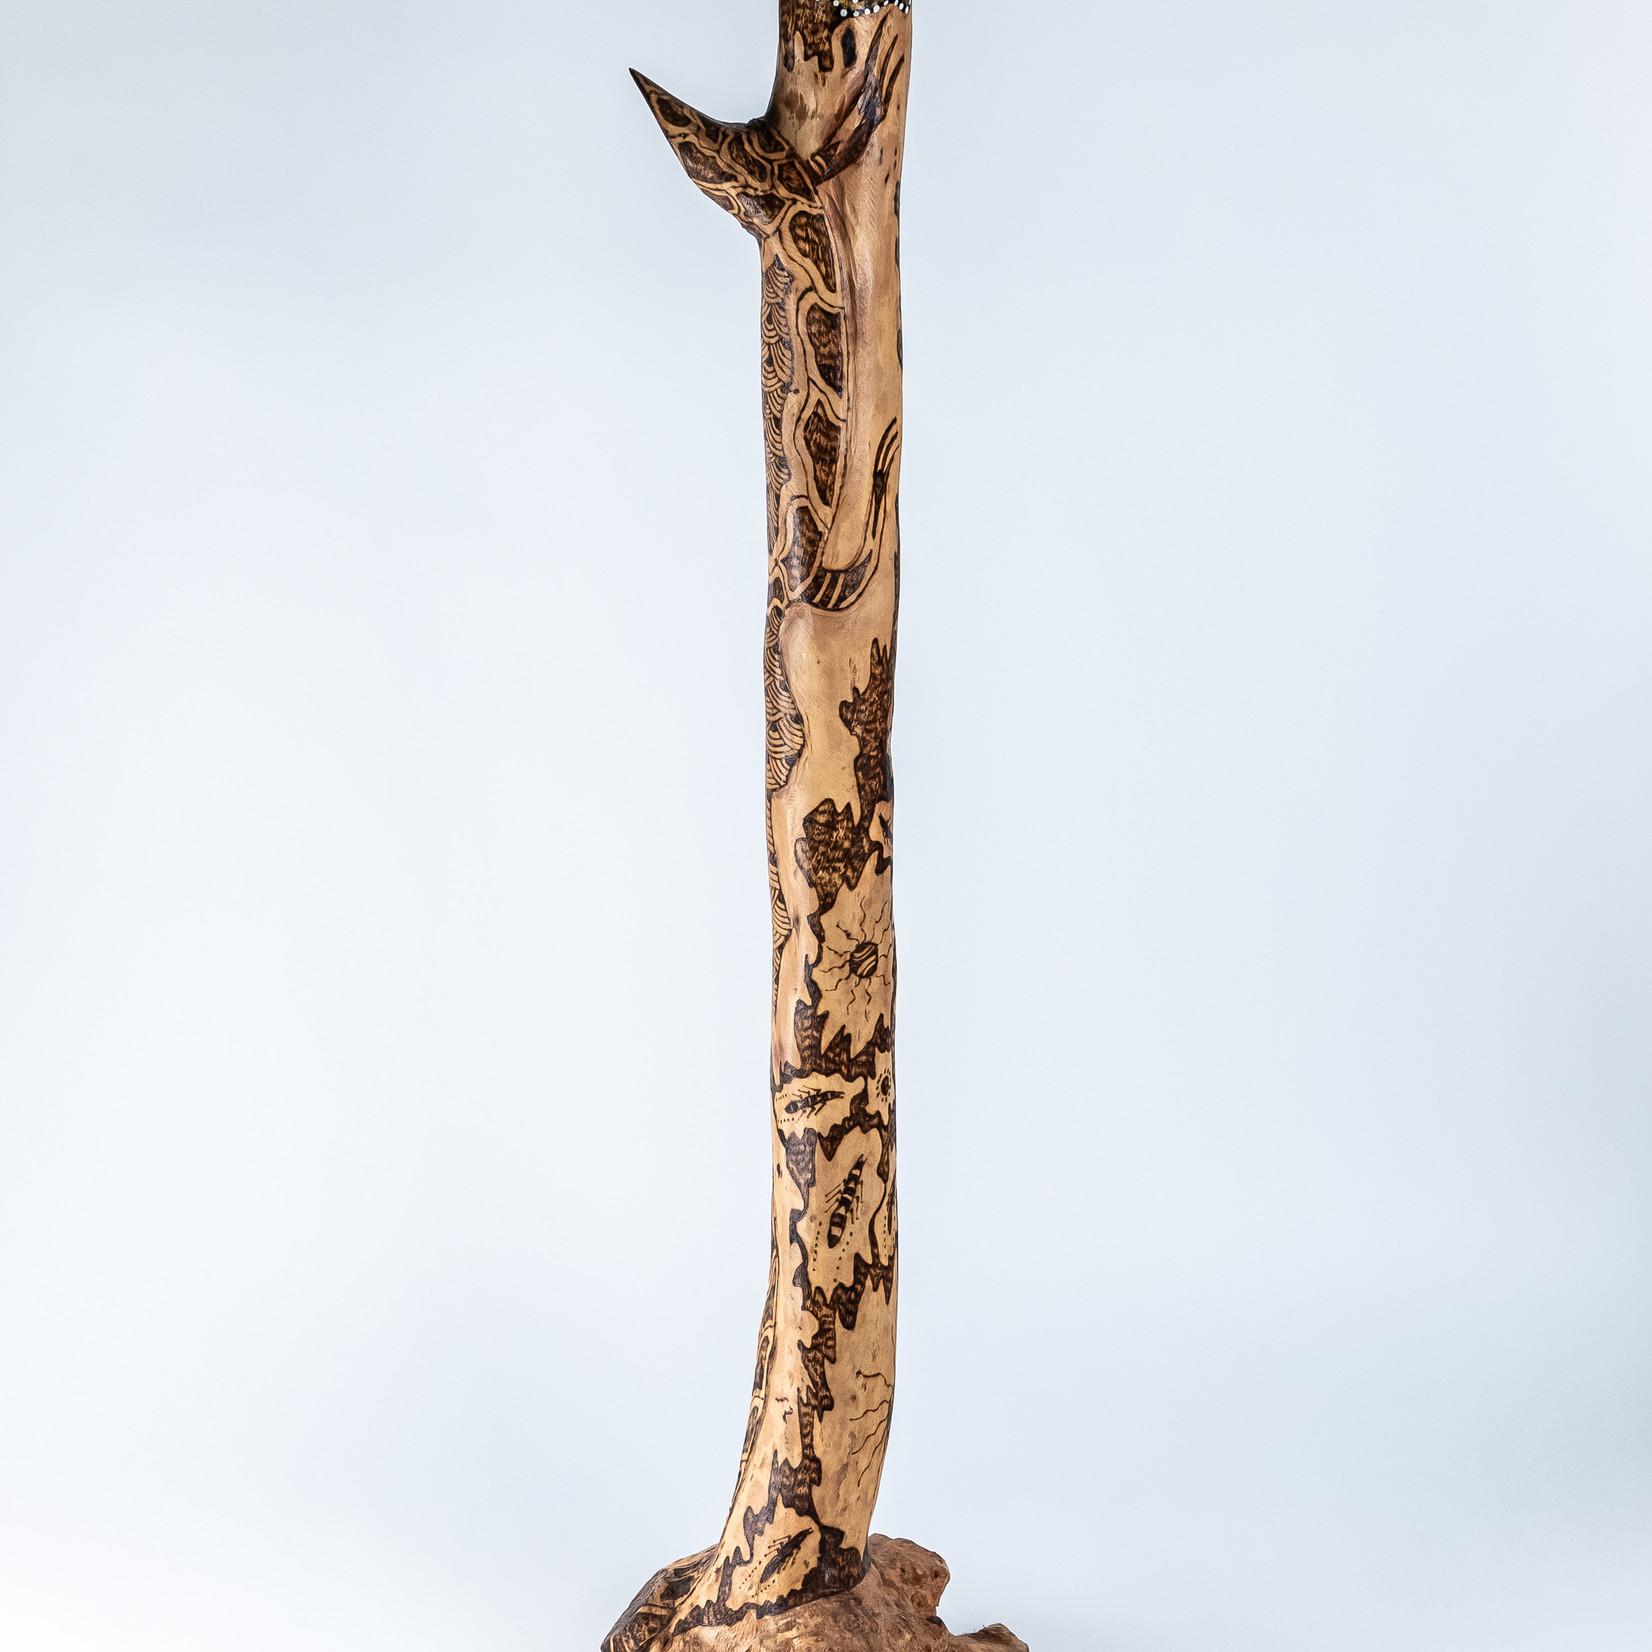 Arthur Kirby Didgeridoo - Uncle Arthur Kirby